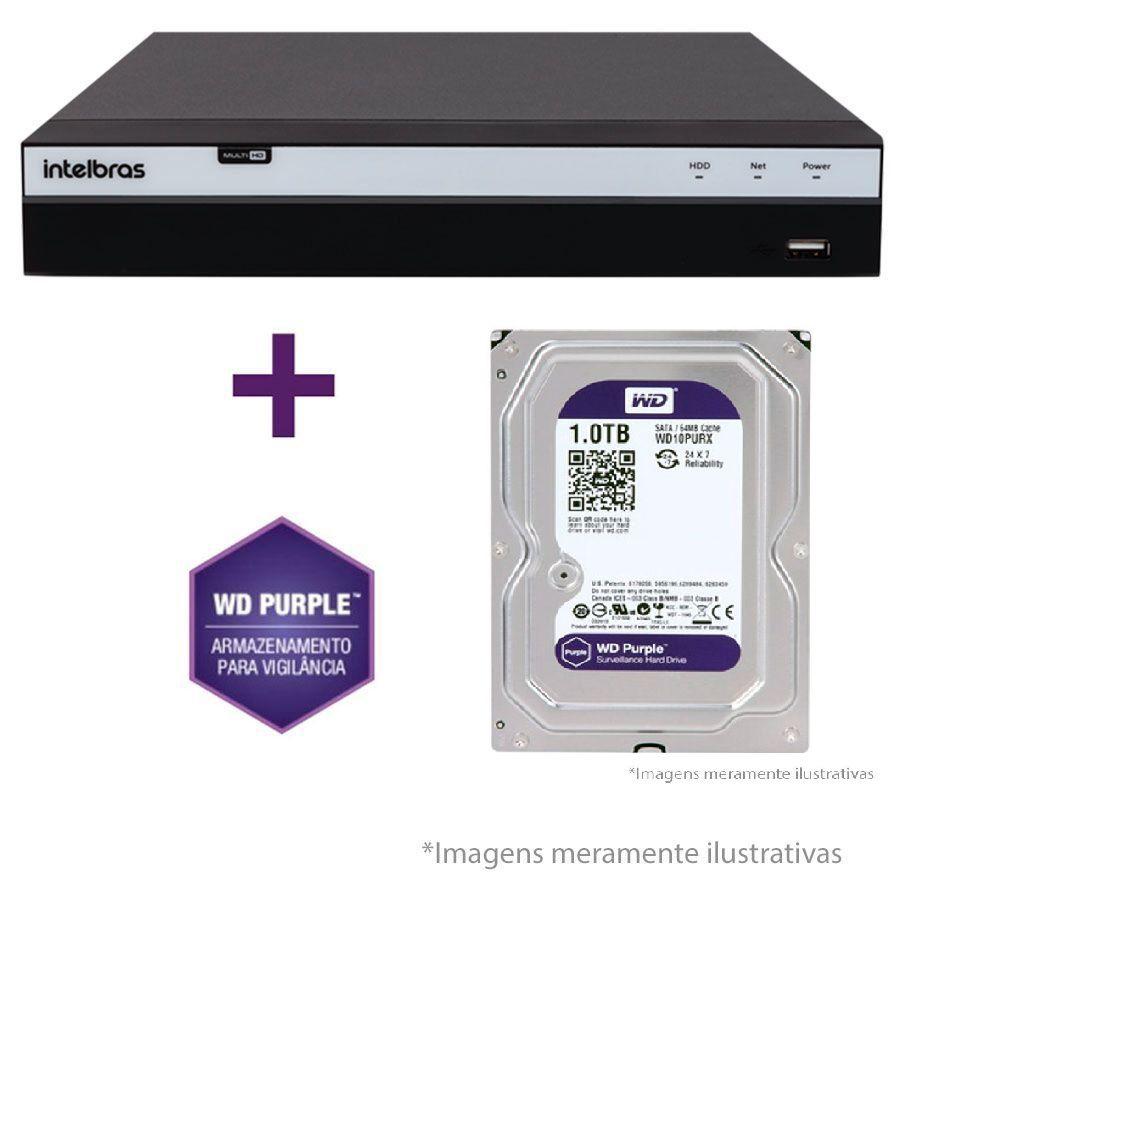 DVR Stand Alone Intelbras MHDX 3116 16 Canais Full HD 1080p Multi HD + 08 Canais IP 5 Mp + HD WD Purple 1TB